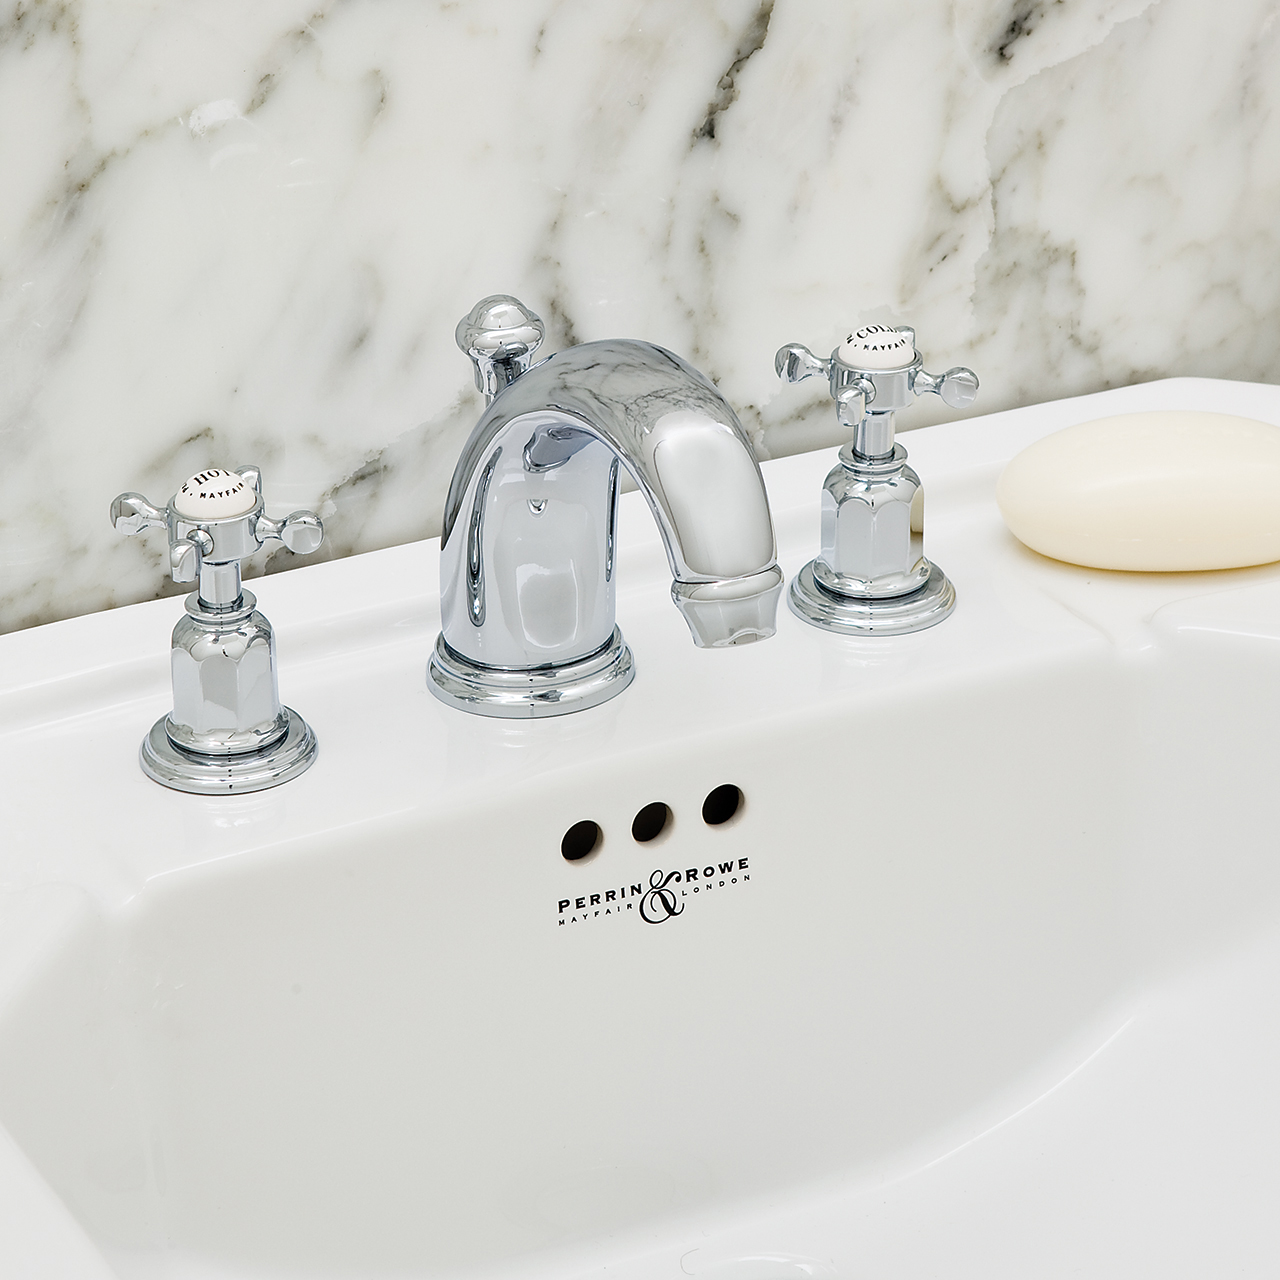 Rohl Perrin and Rowe Bathroom Faucet U.3701 U.3700 | Bliss Bath ...